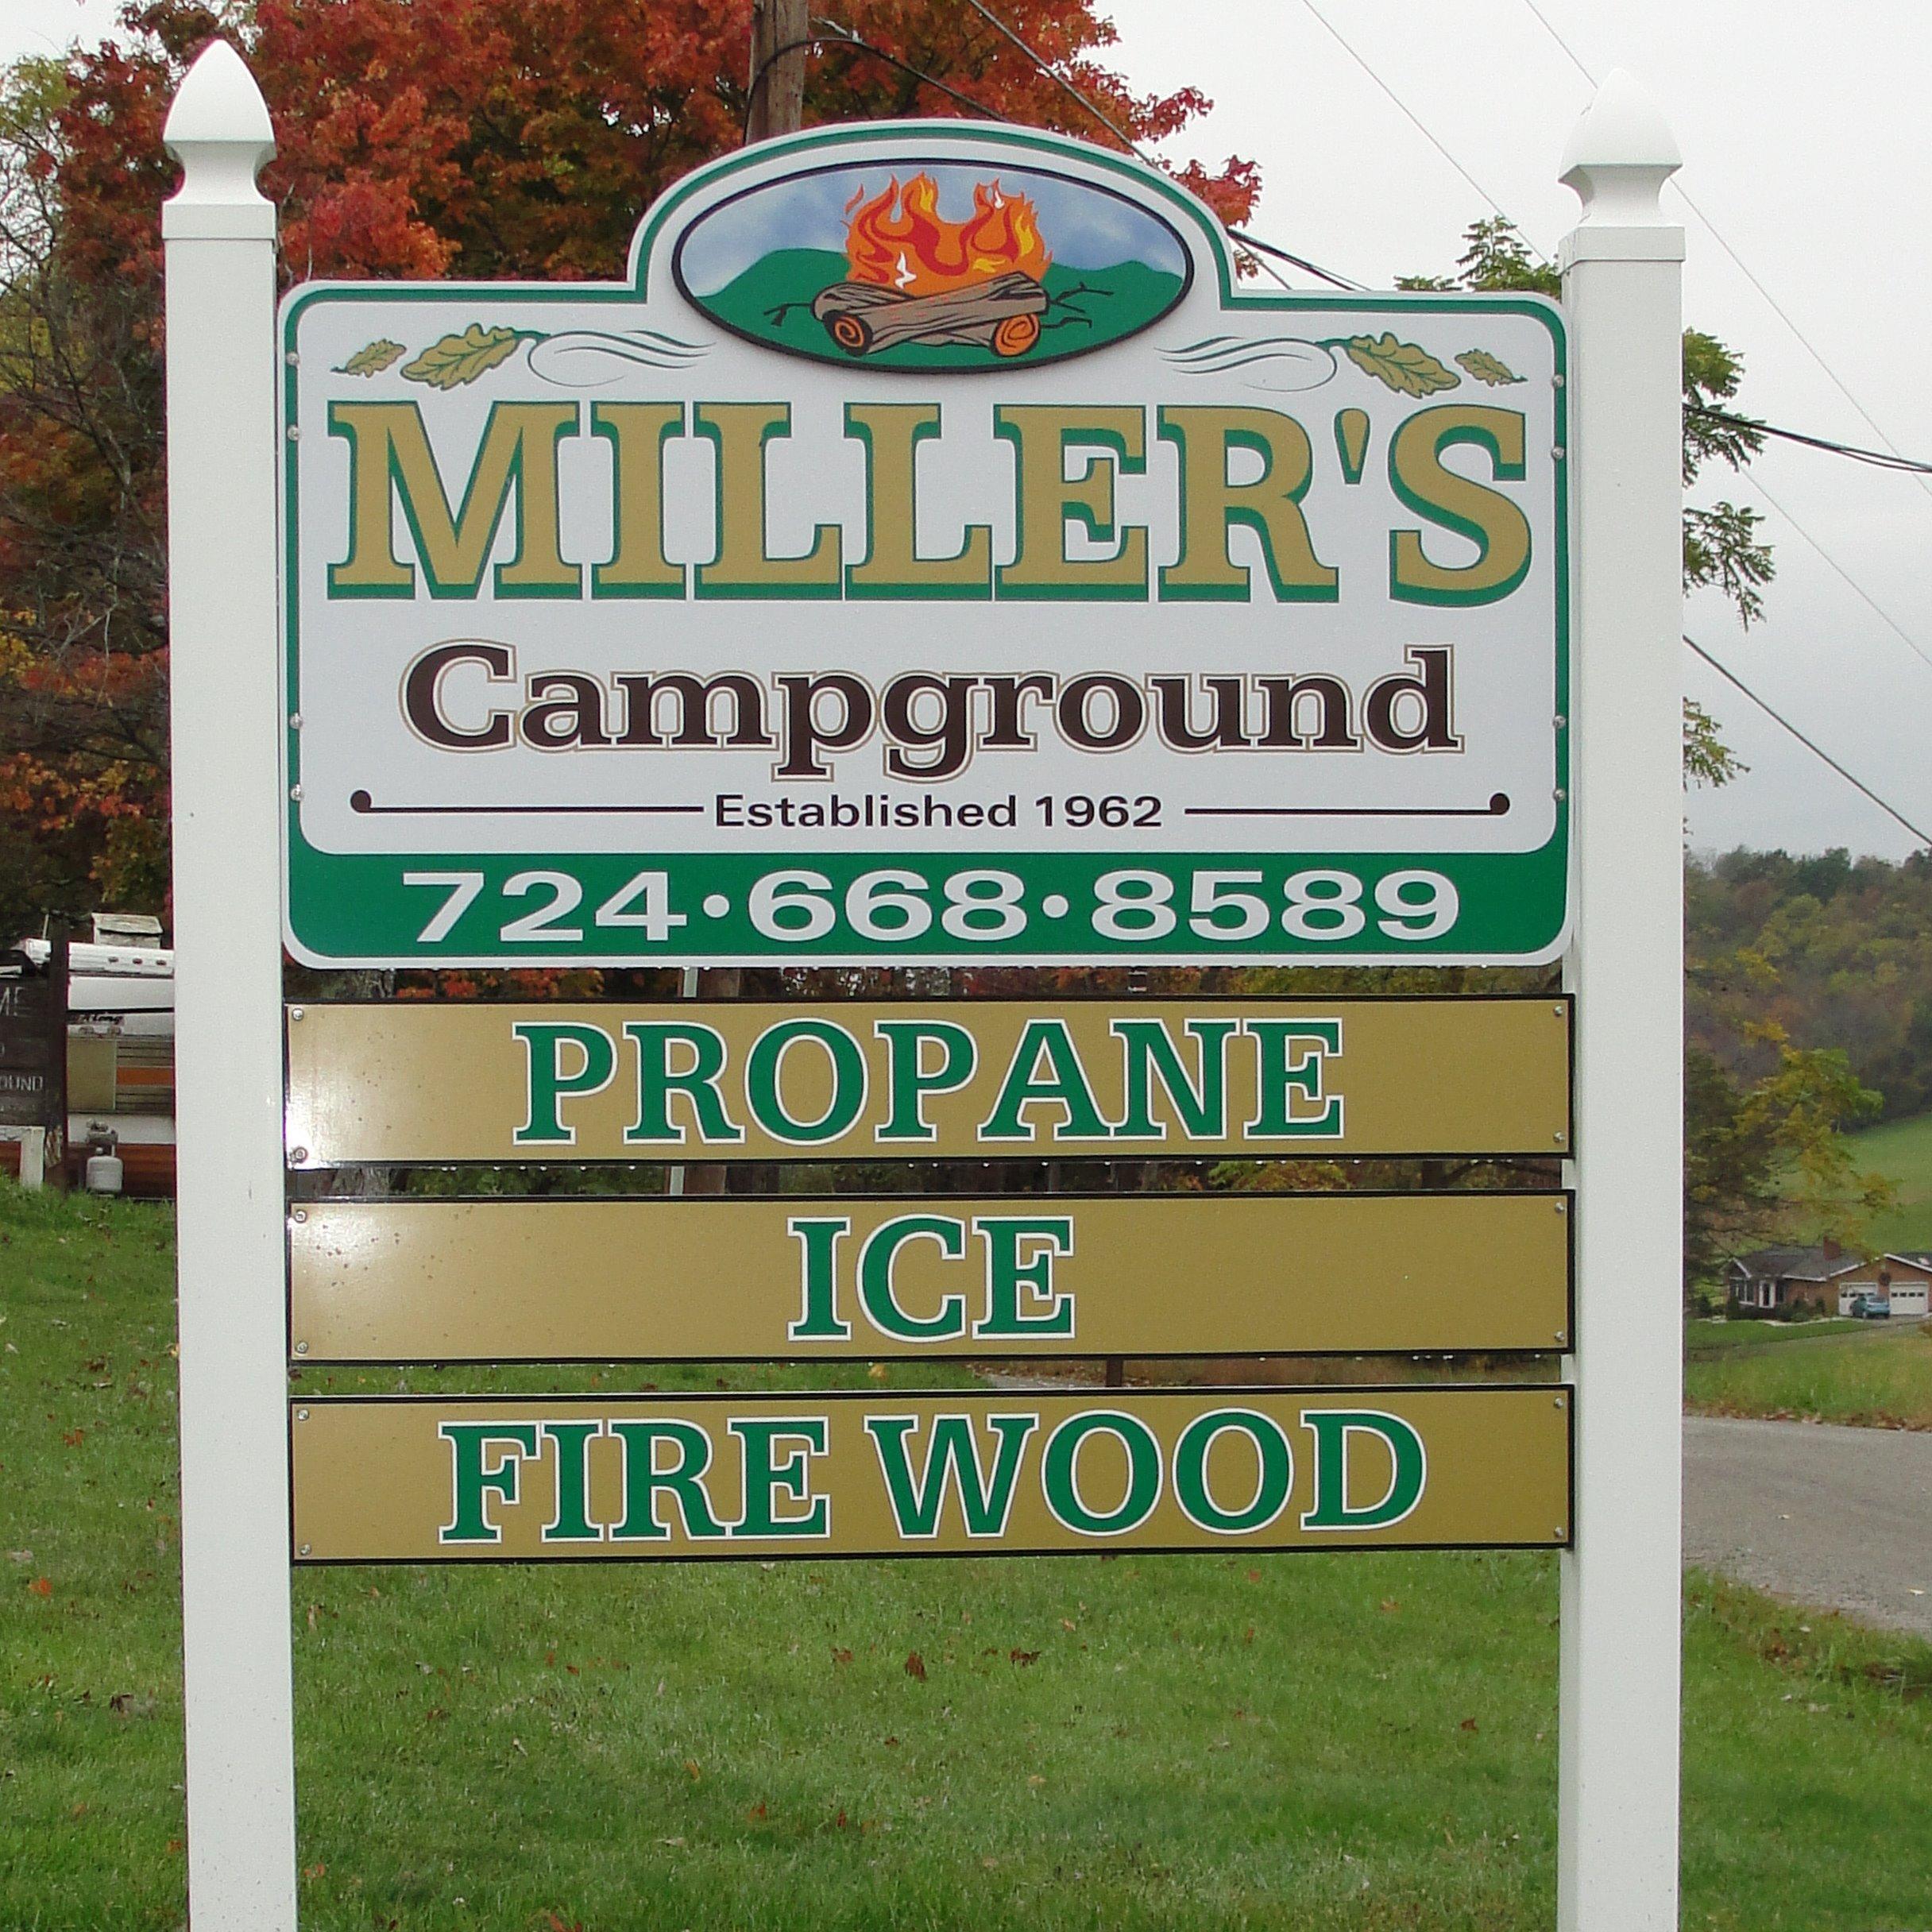 Miller's Campground